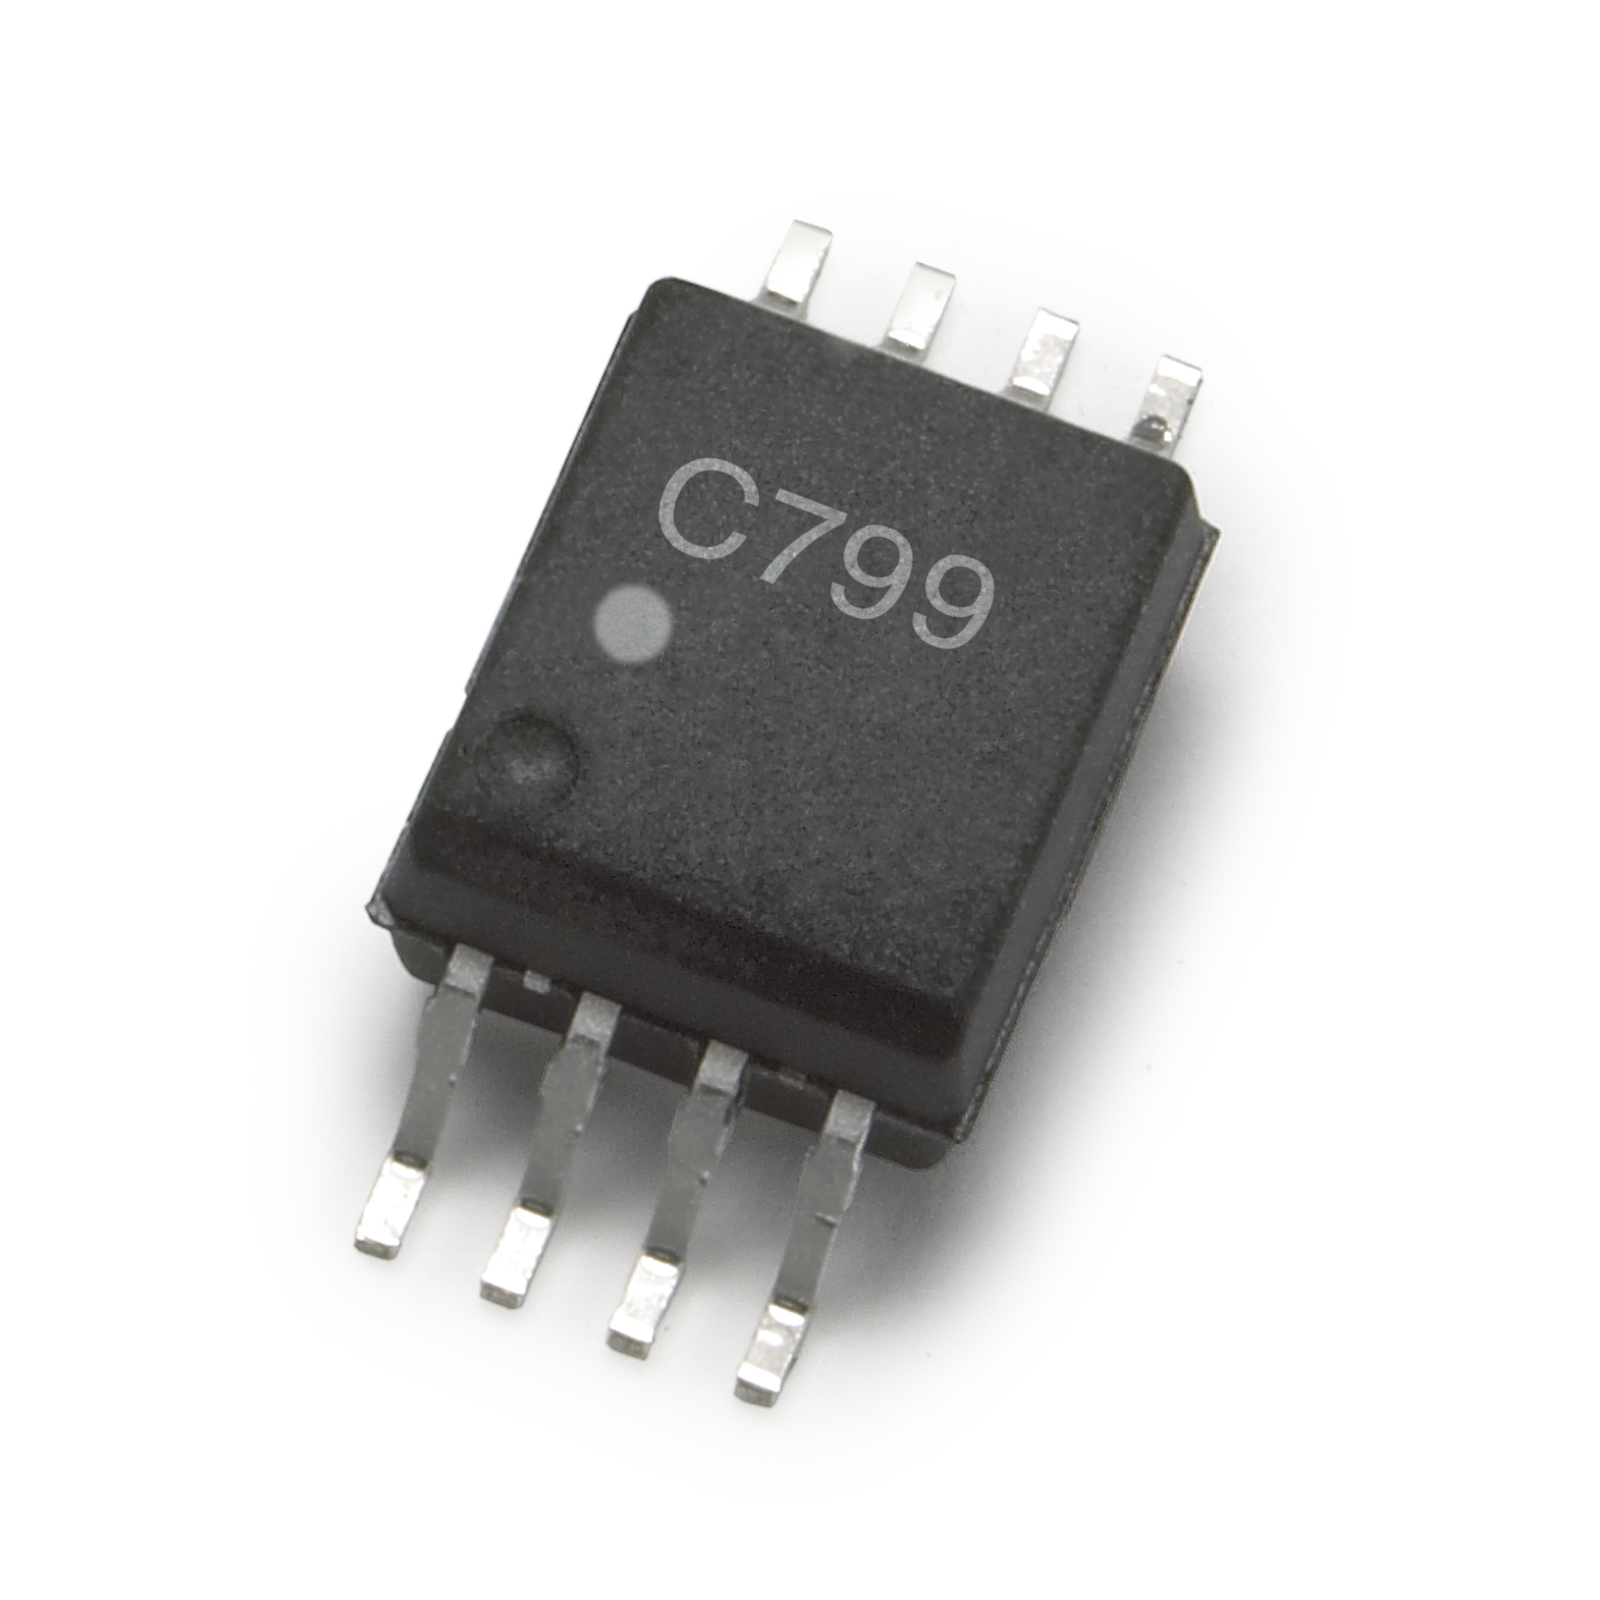 ACPL-C799_wht.jpg